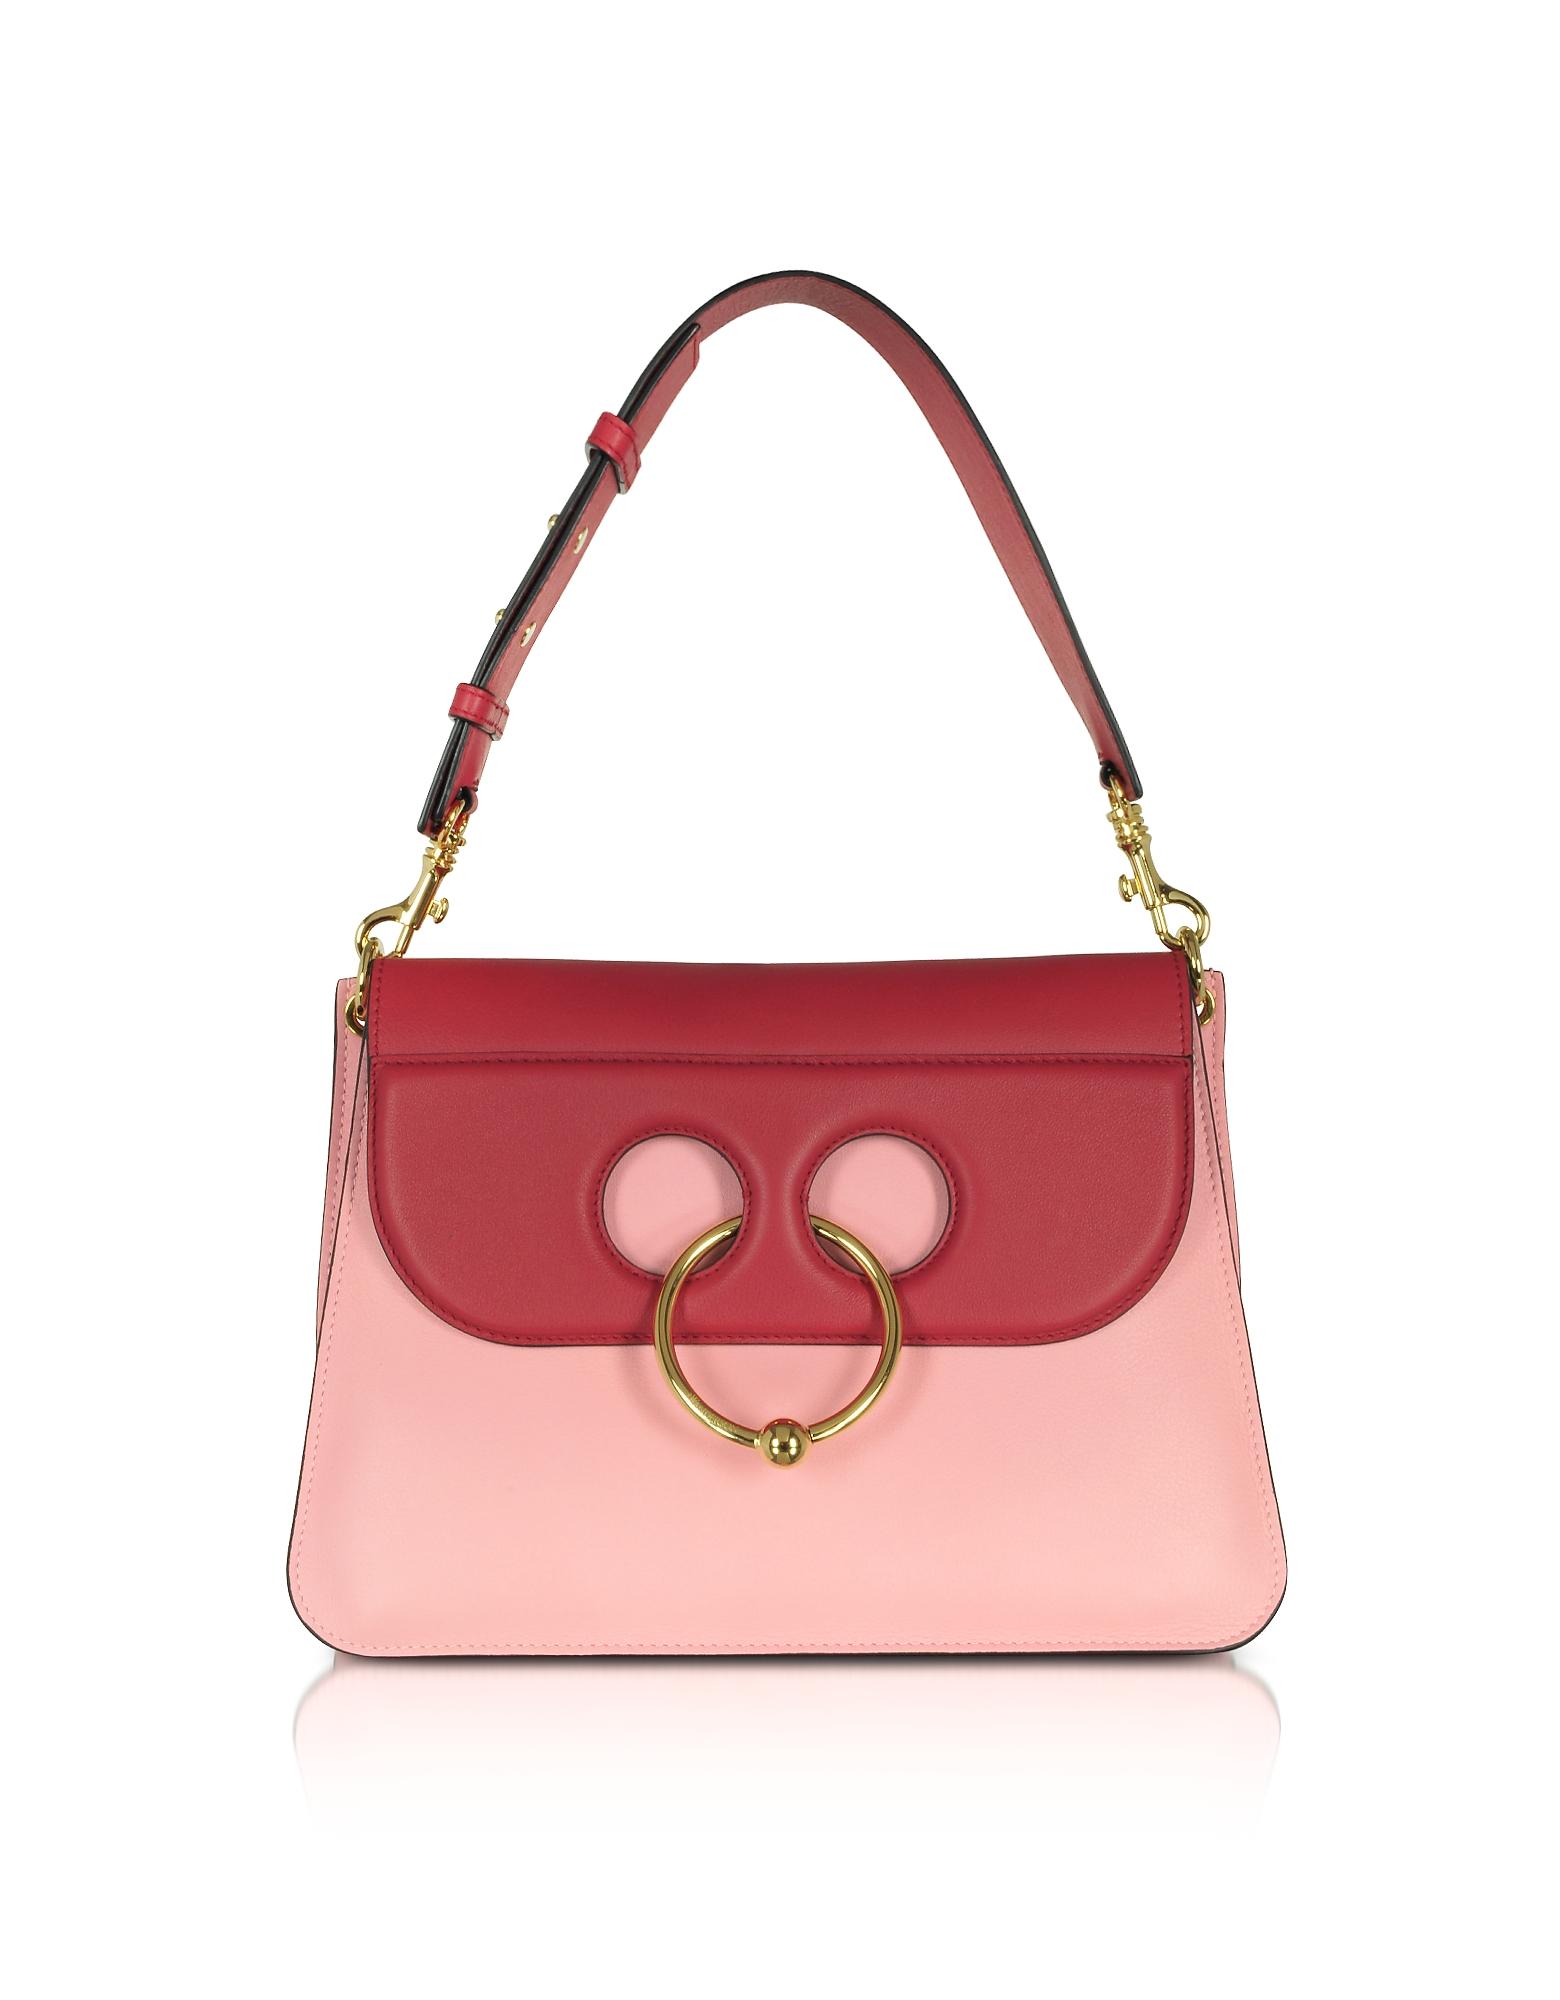 JW Anderson Handbags, Crimson Red and Pink Bubblegum Leather Medium Pierce Bag